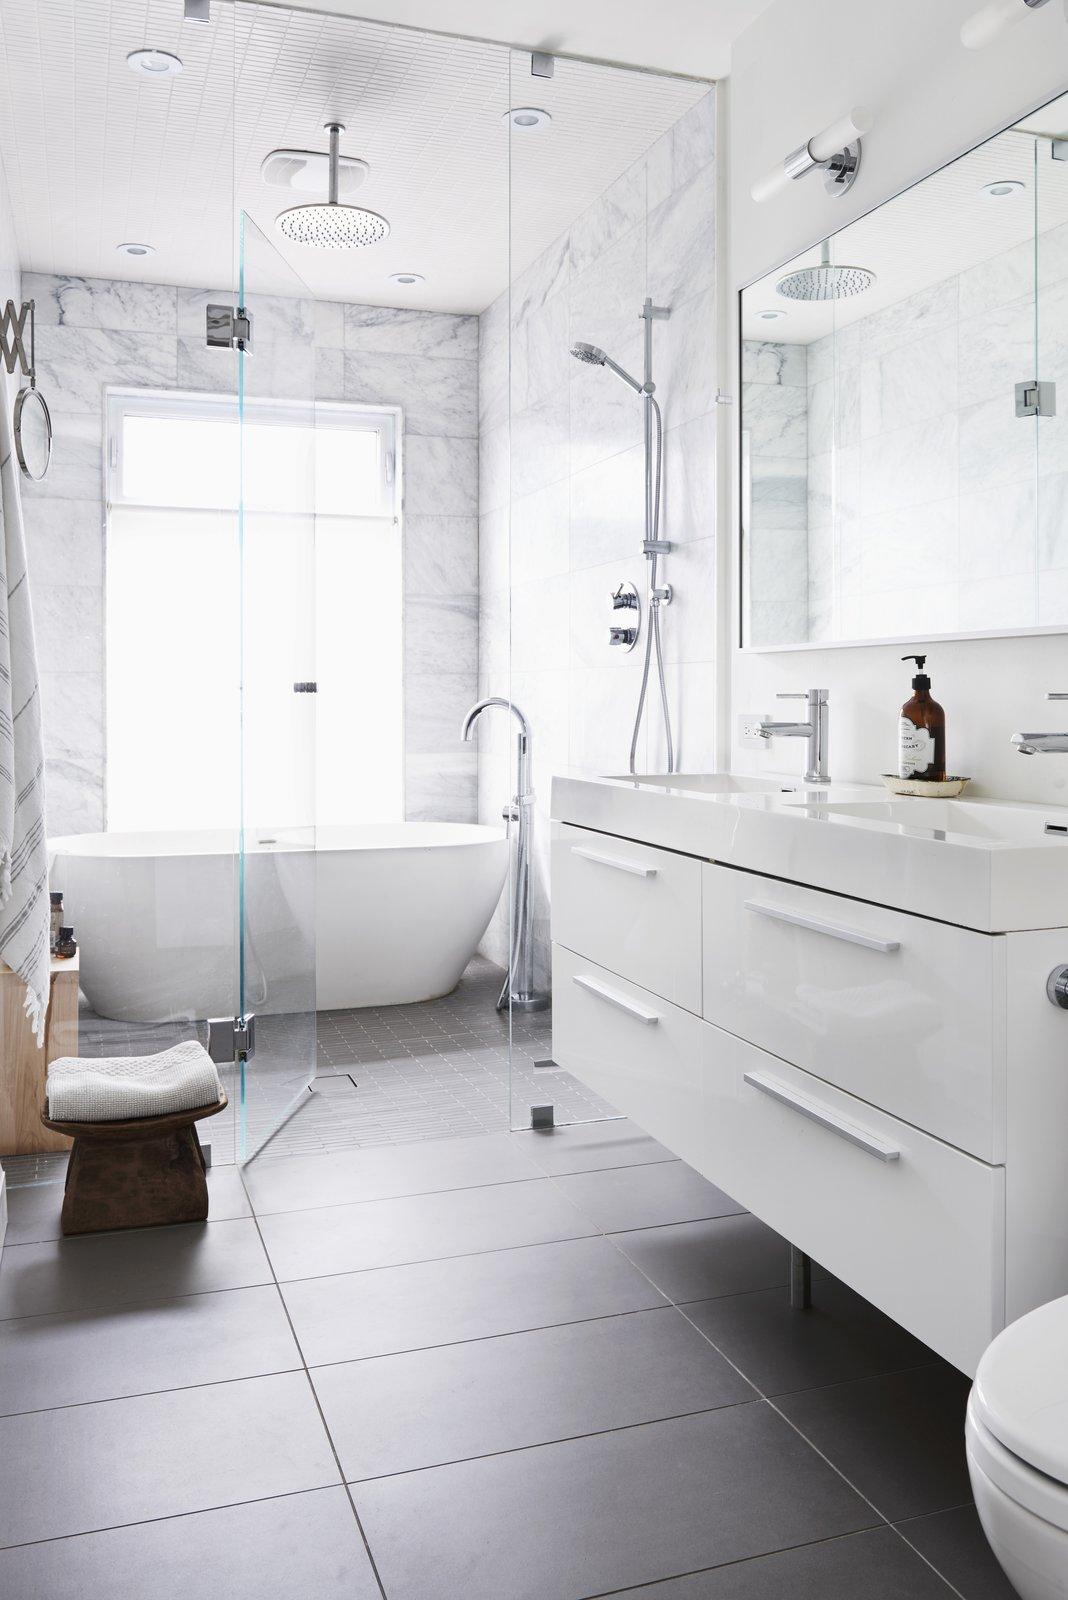 Photo 2 of 2 in Family Bathroom Renovation by carolina murialdo - Dwell